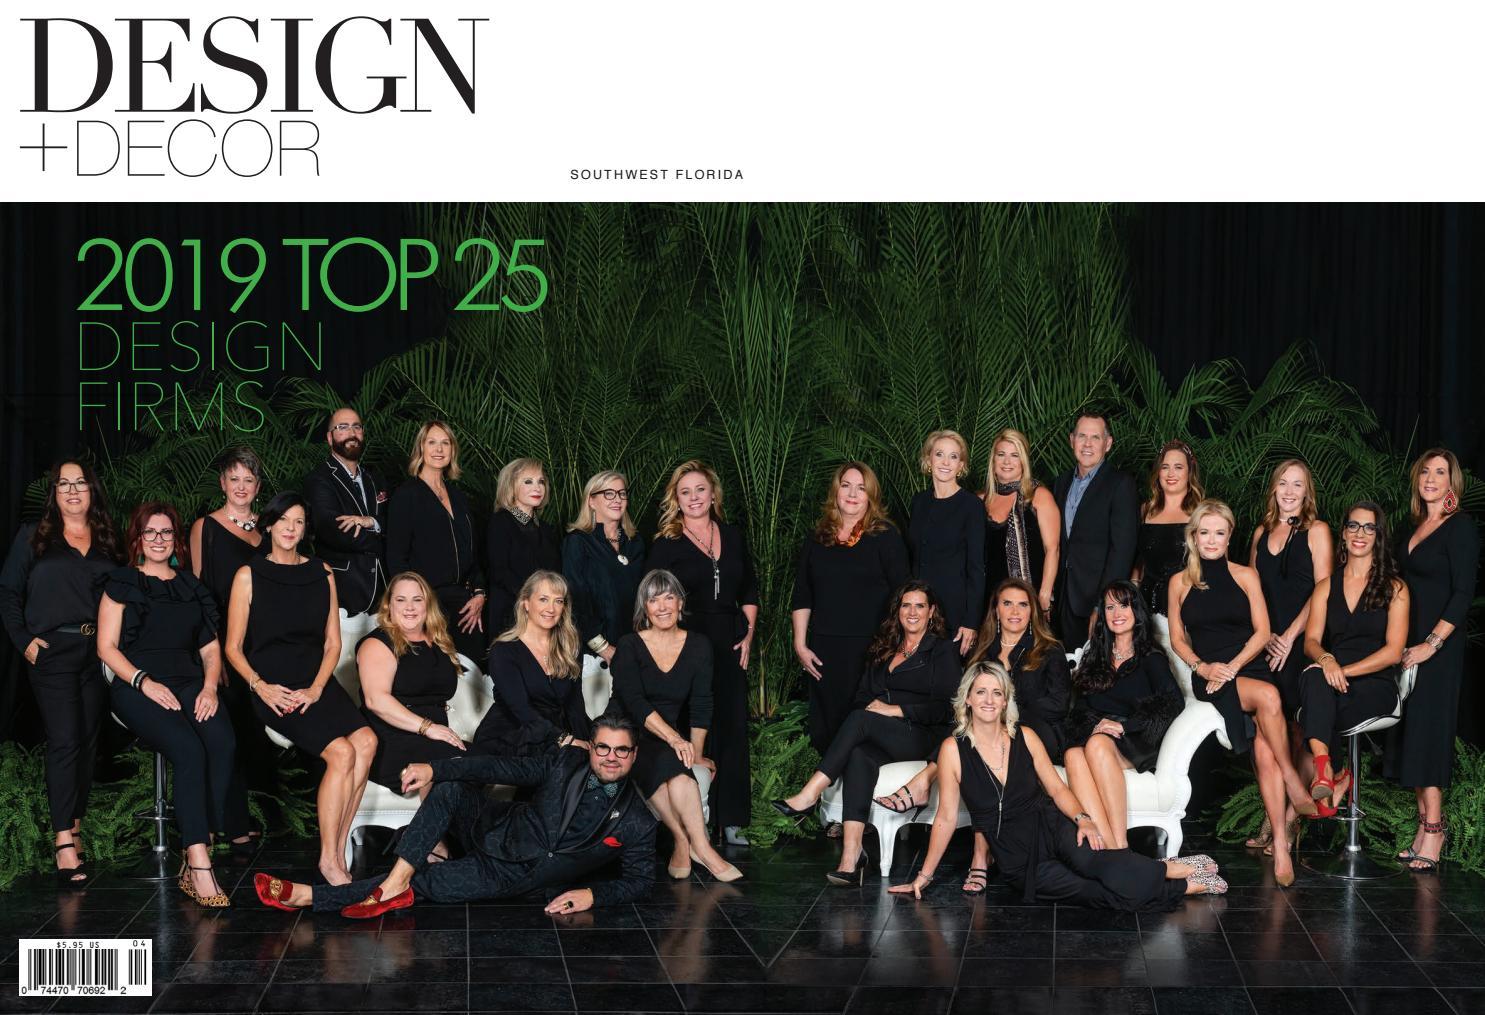 Design Decor Southwest Florida Fall 2019 By East Coast Home Publishing Issuu